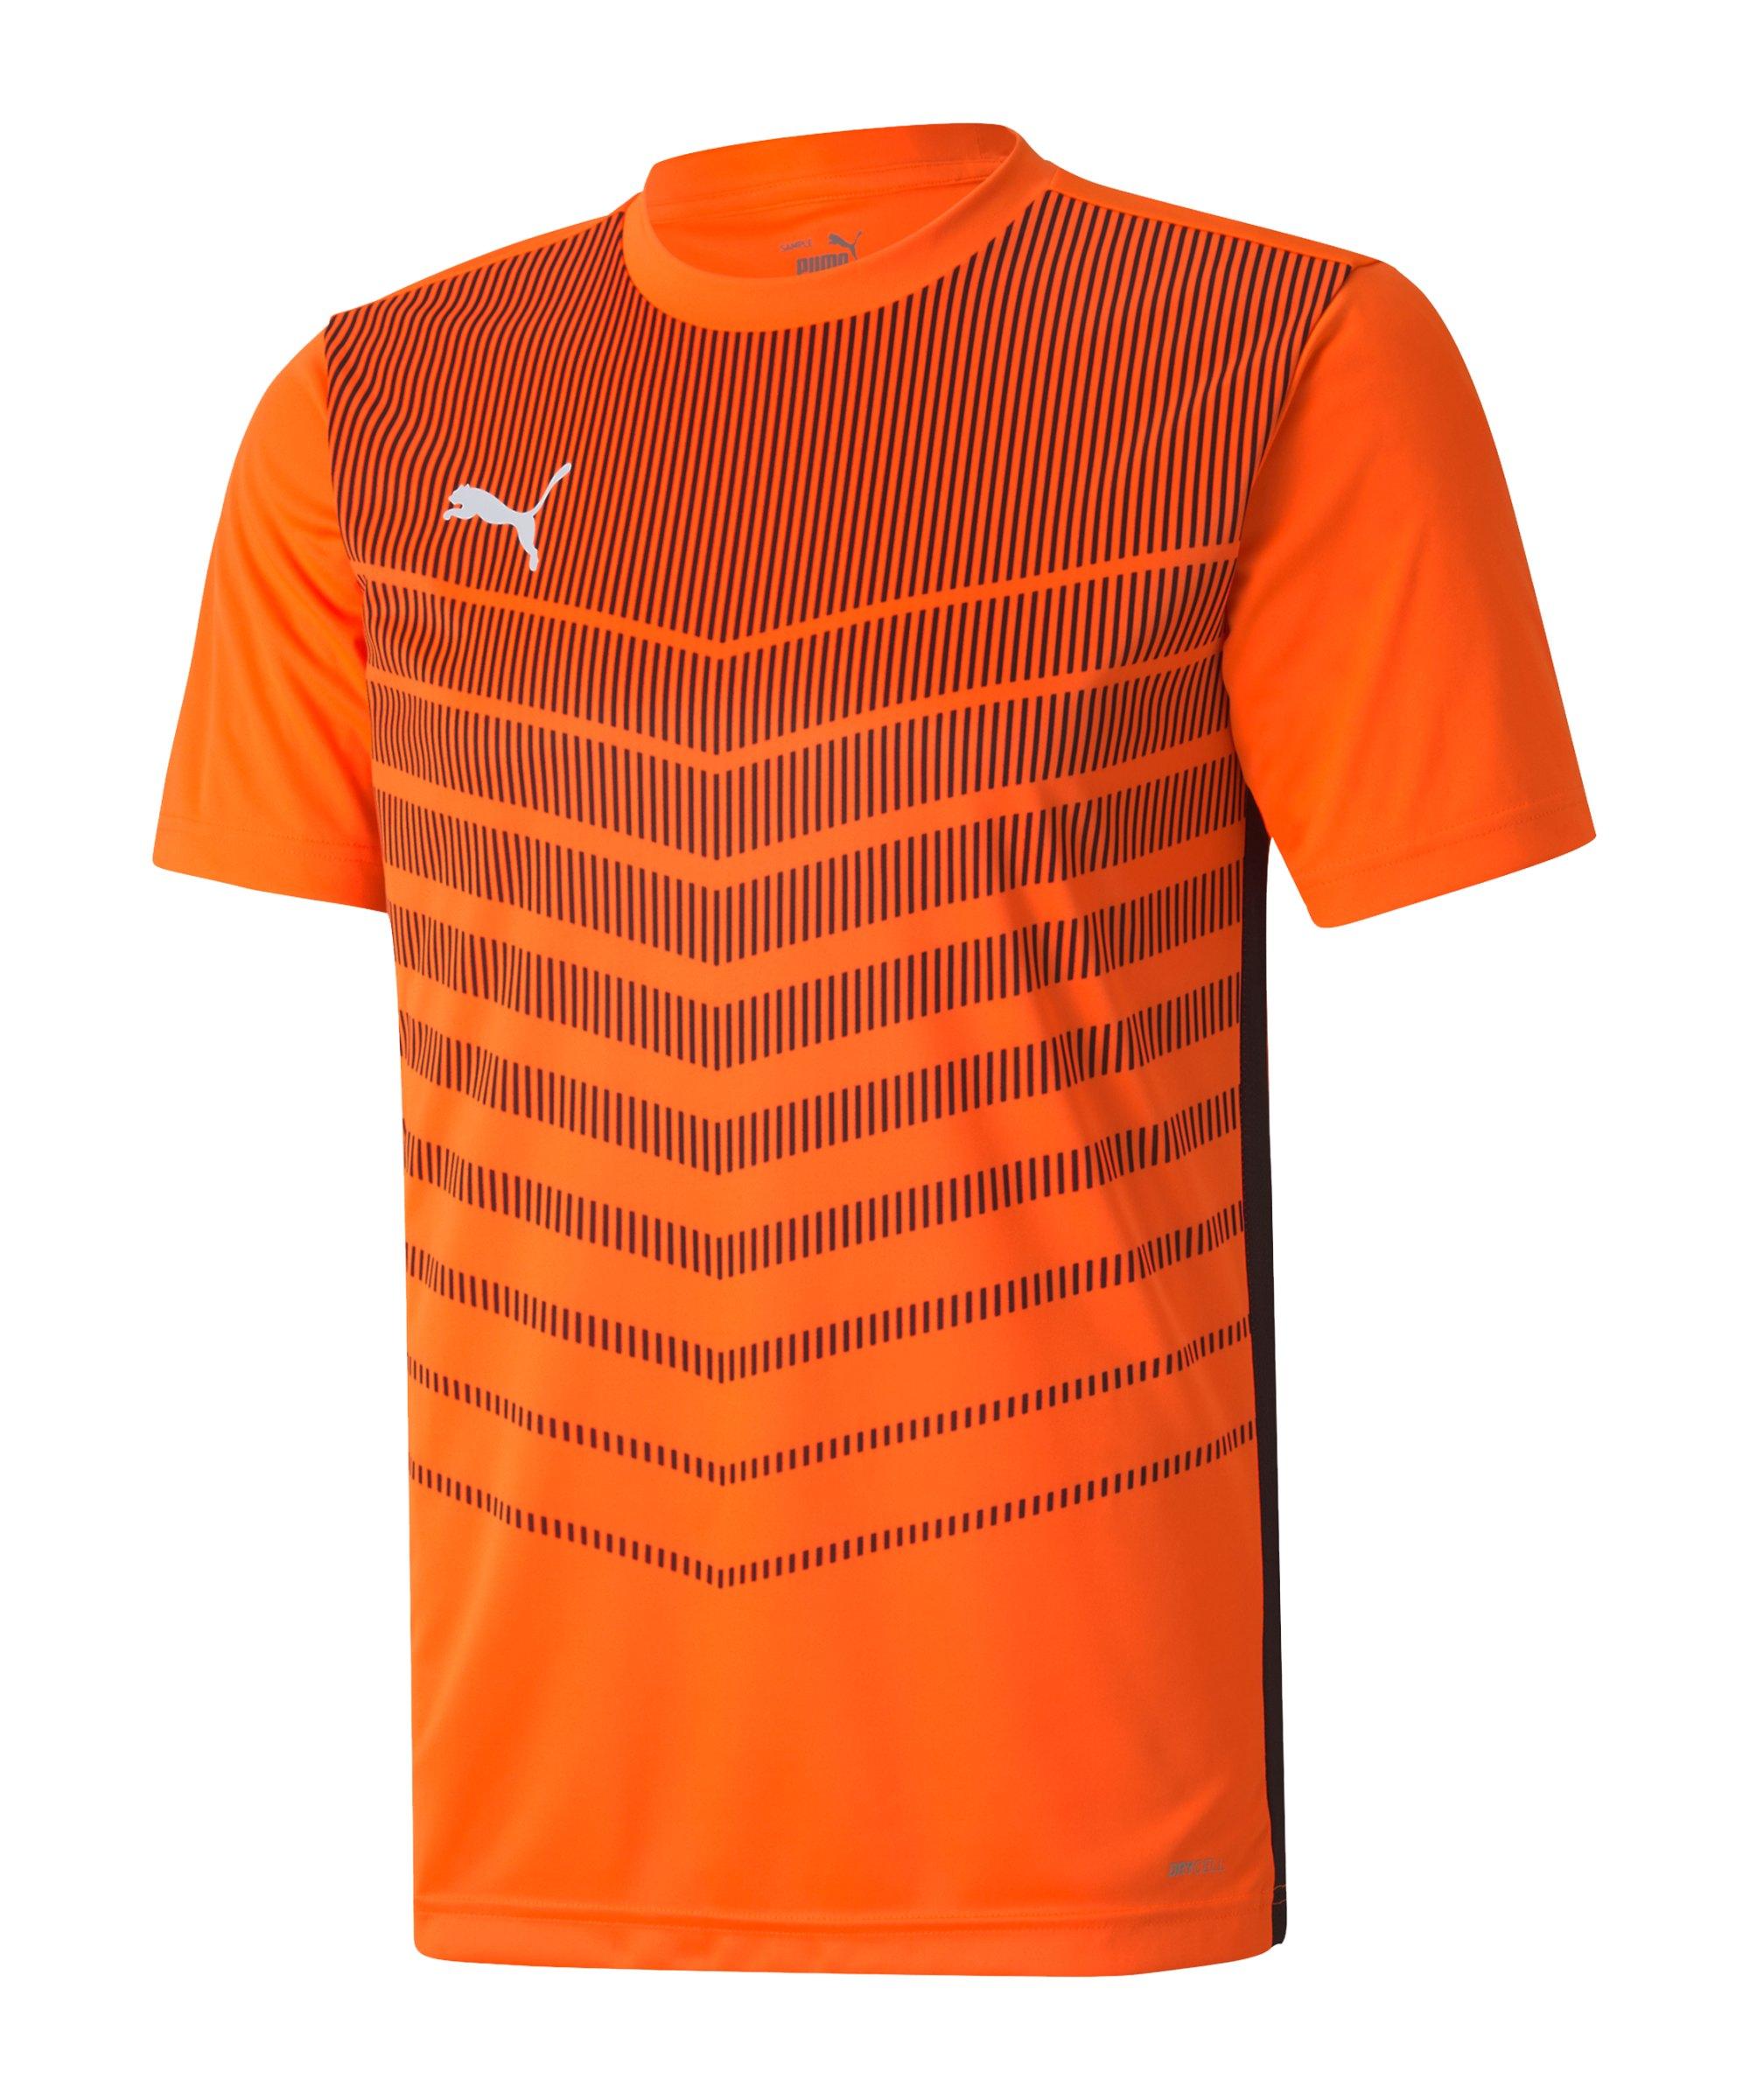 PUMA ftblPLAY Graphic T-Shirt Orange F20 - orange